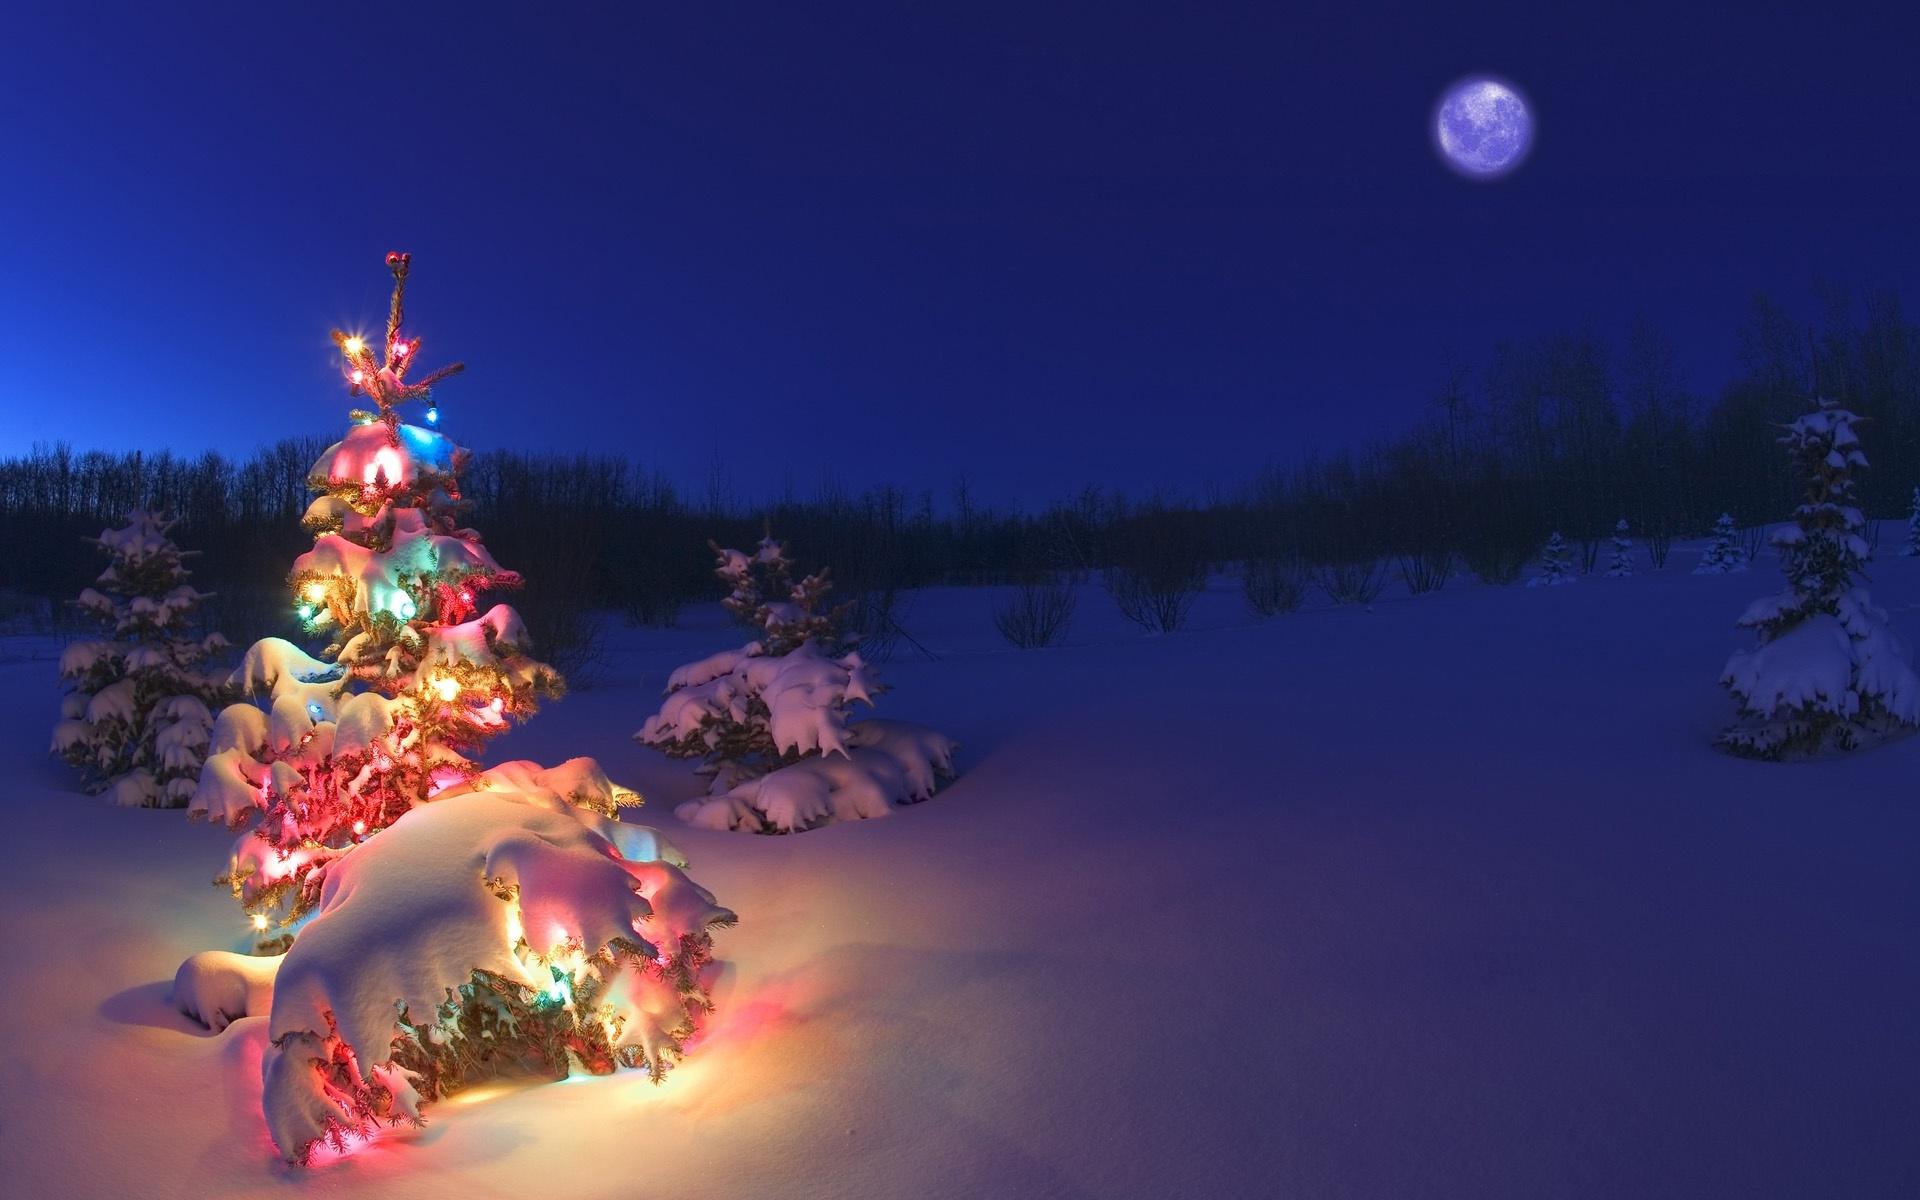 Weihnachtsbilder Desktop Kostenlos.Free Download Computers Desktop With Christmas Lights Snow Desktop